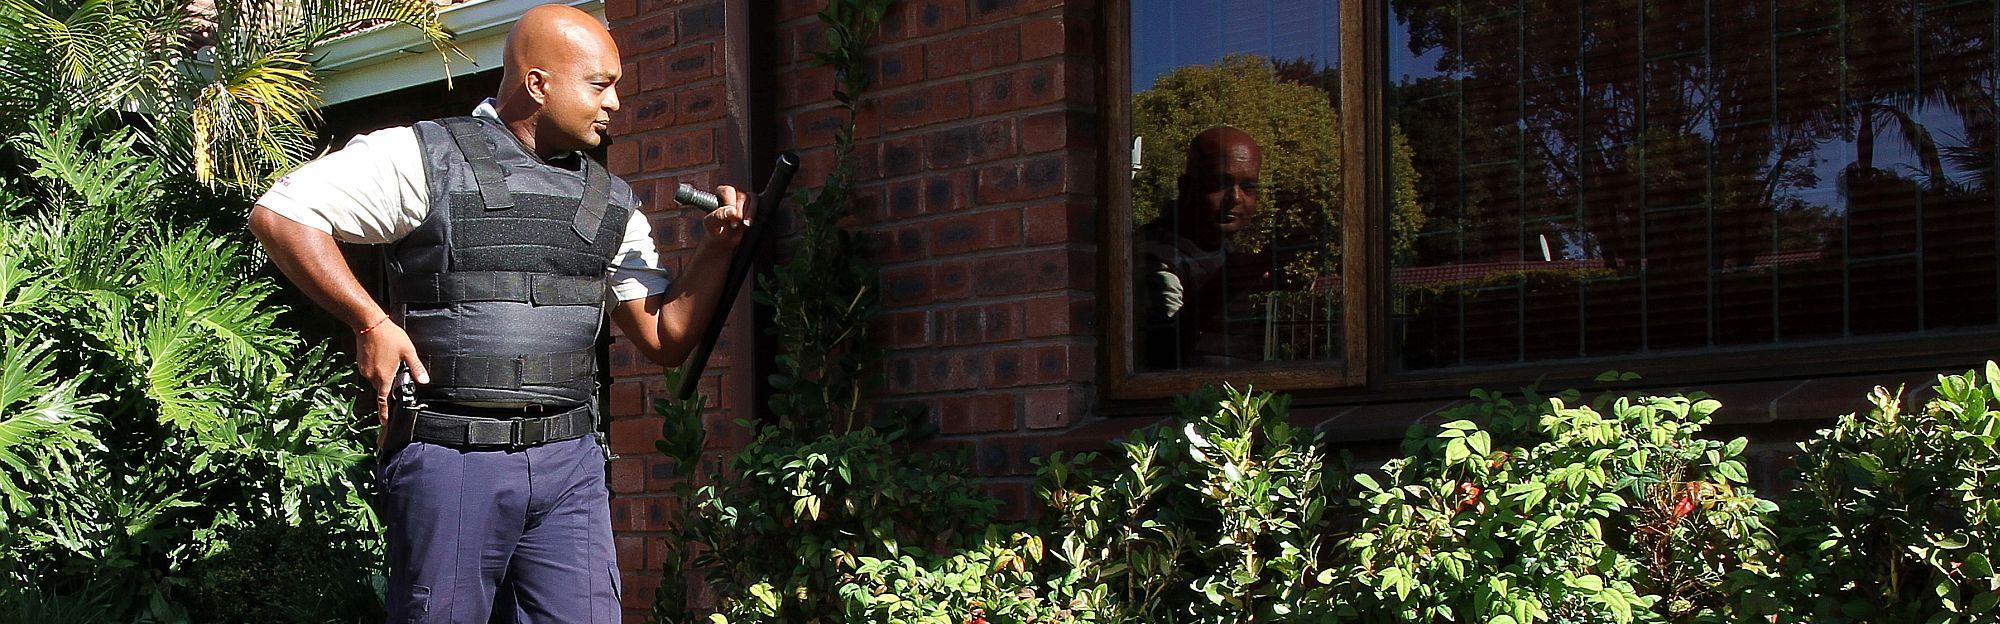 2000x624_Security Company_Pietermaritzburg_KwaZulu Natal